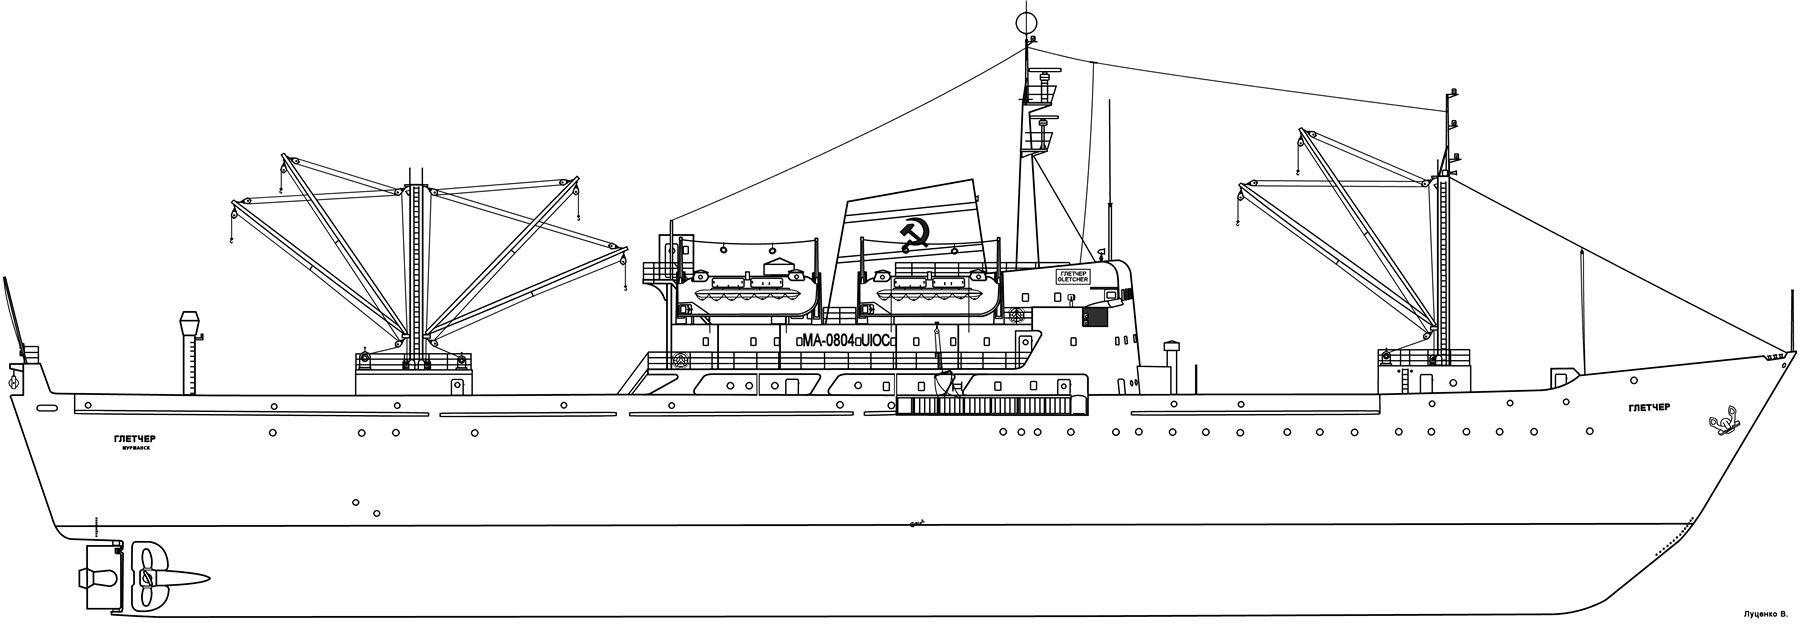 grumant type fishing freezer trawler and pelengator type training trawler. Black Bedroom Furniture Sets. Home Design Ideas